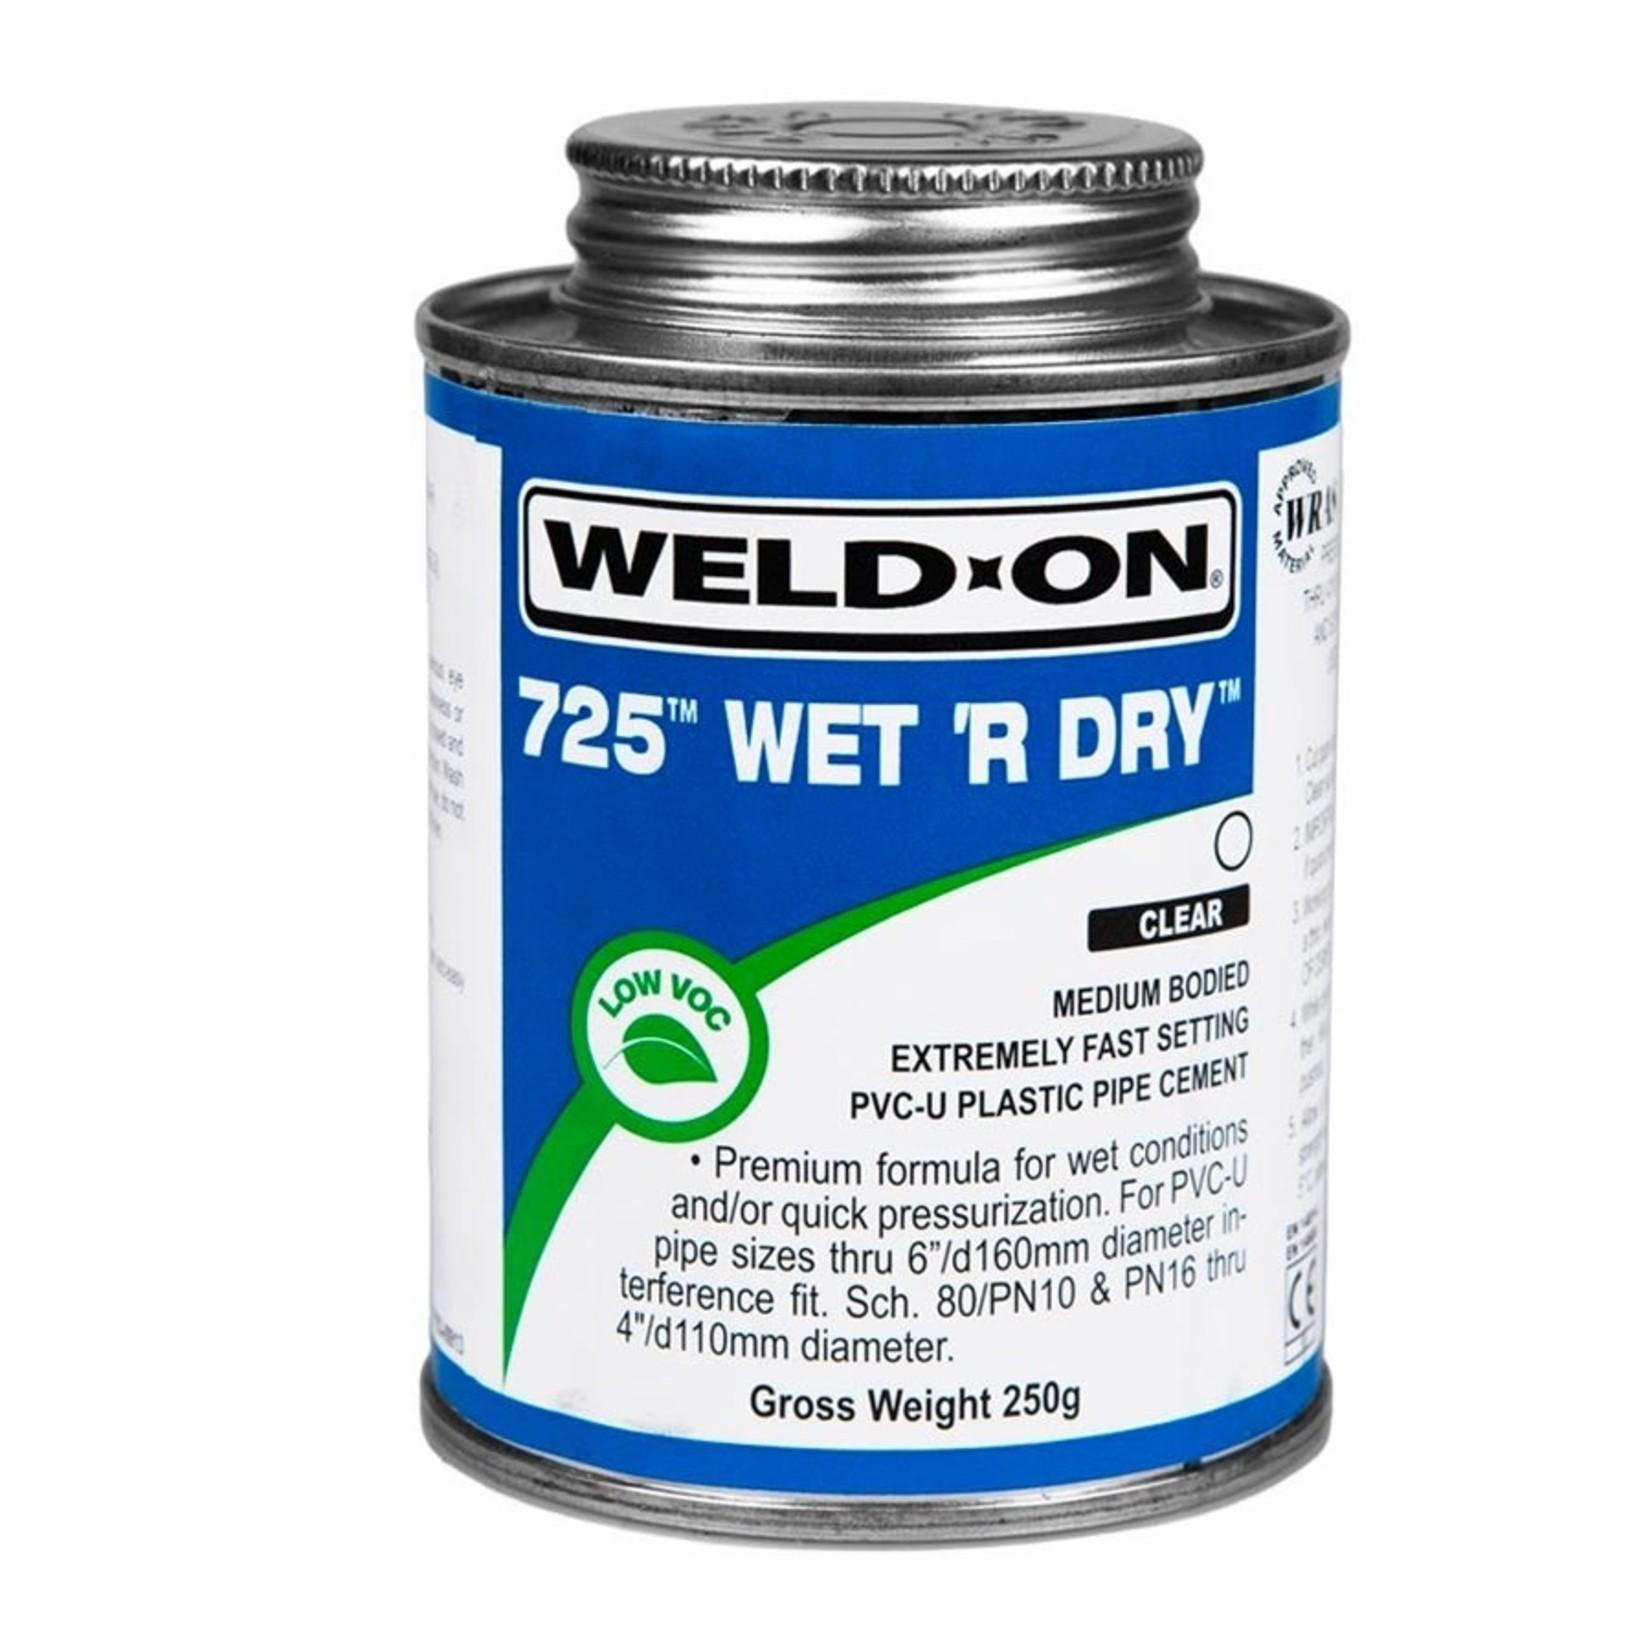 725 GLUE BLUE WET'R DRY.25PT